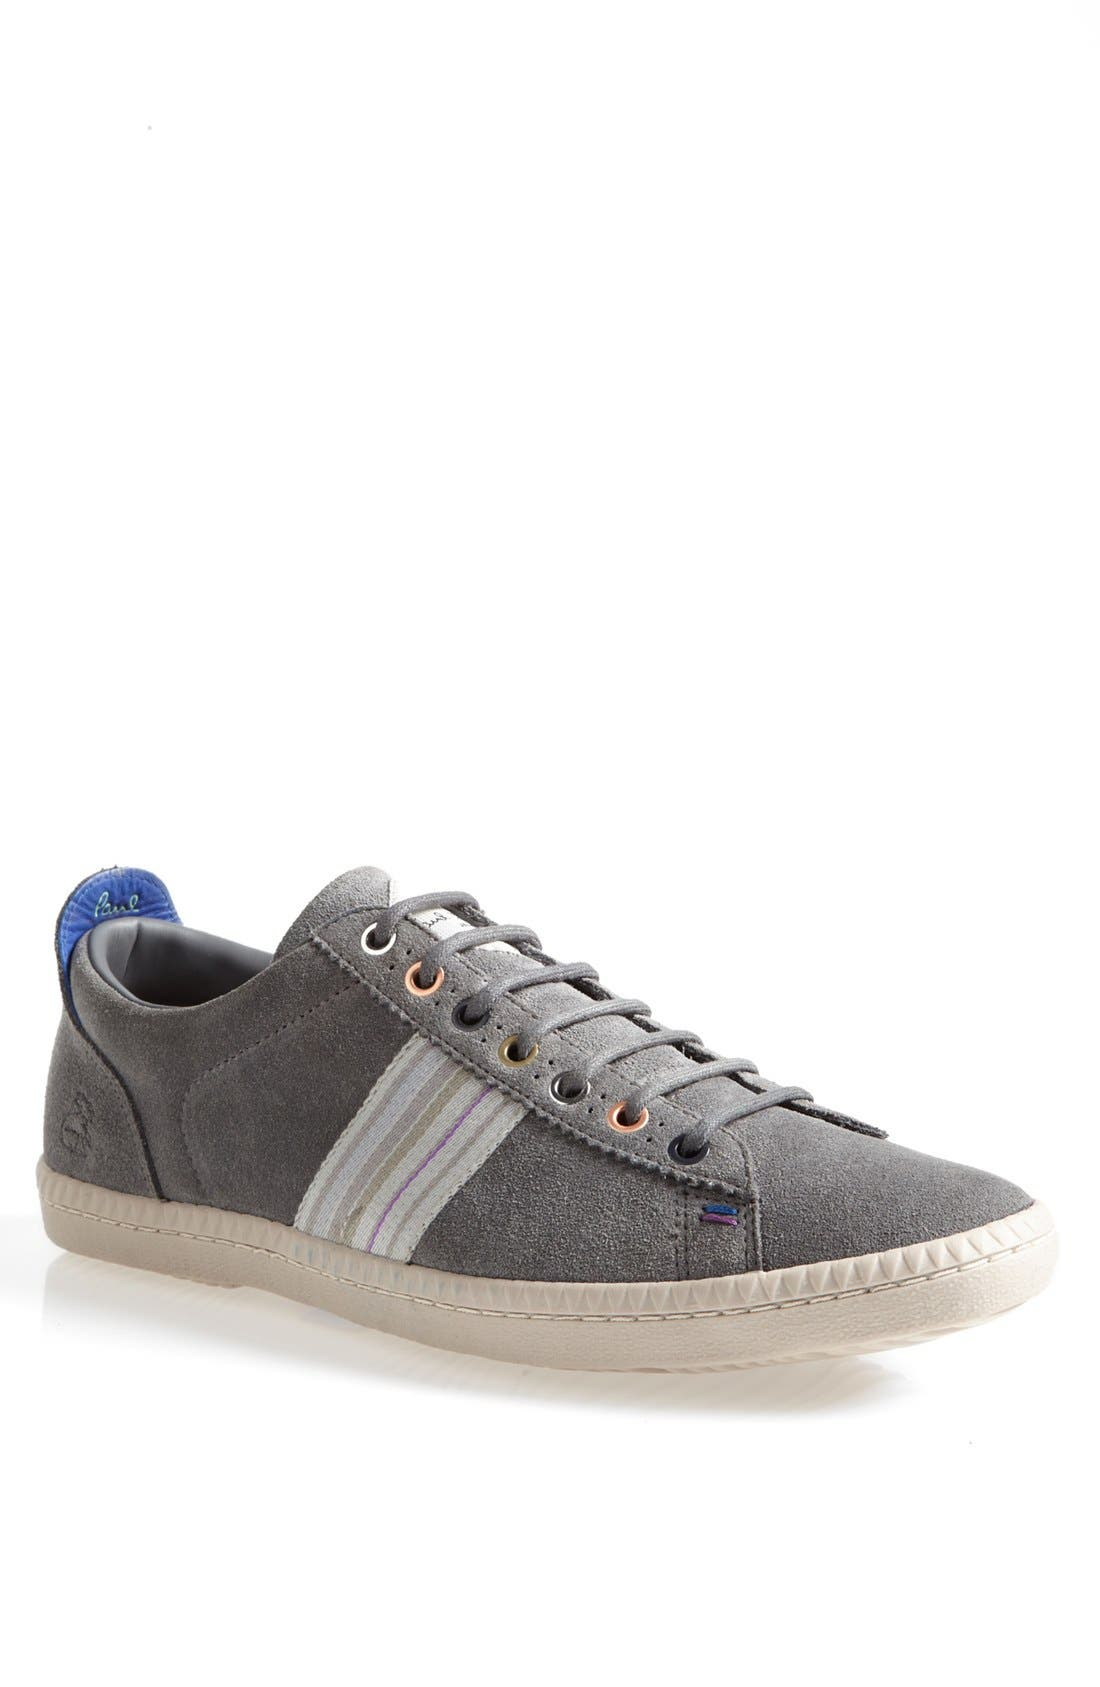 Main Image - Paul Smith 'Osmo' Sneaker